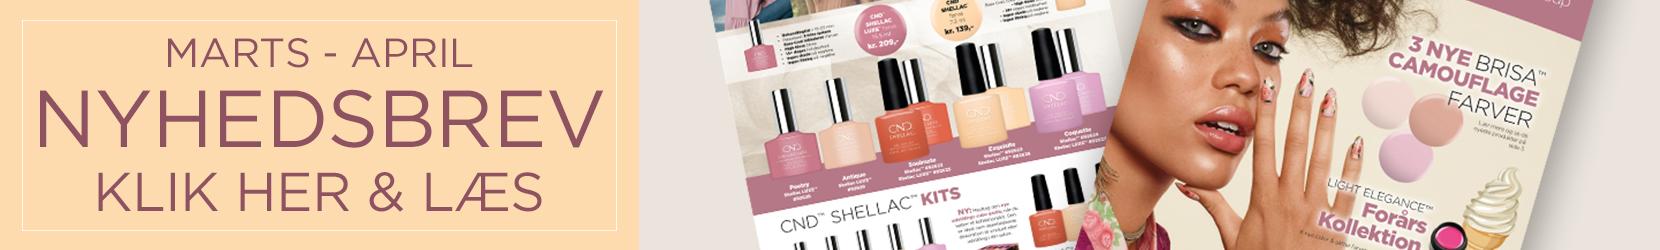 insight cosmetics group